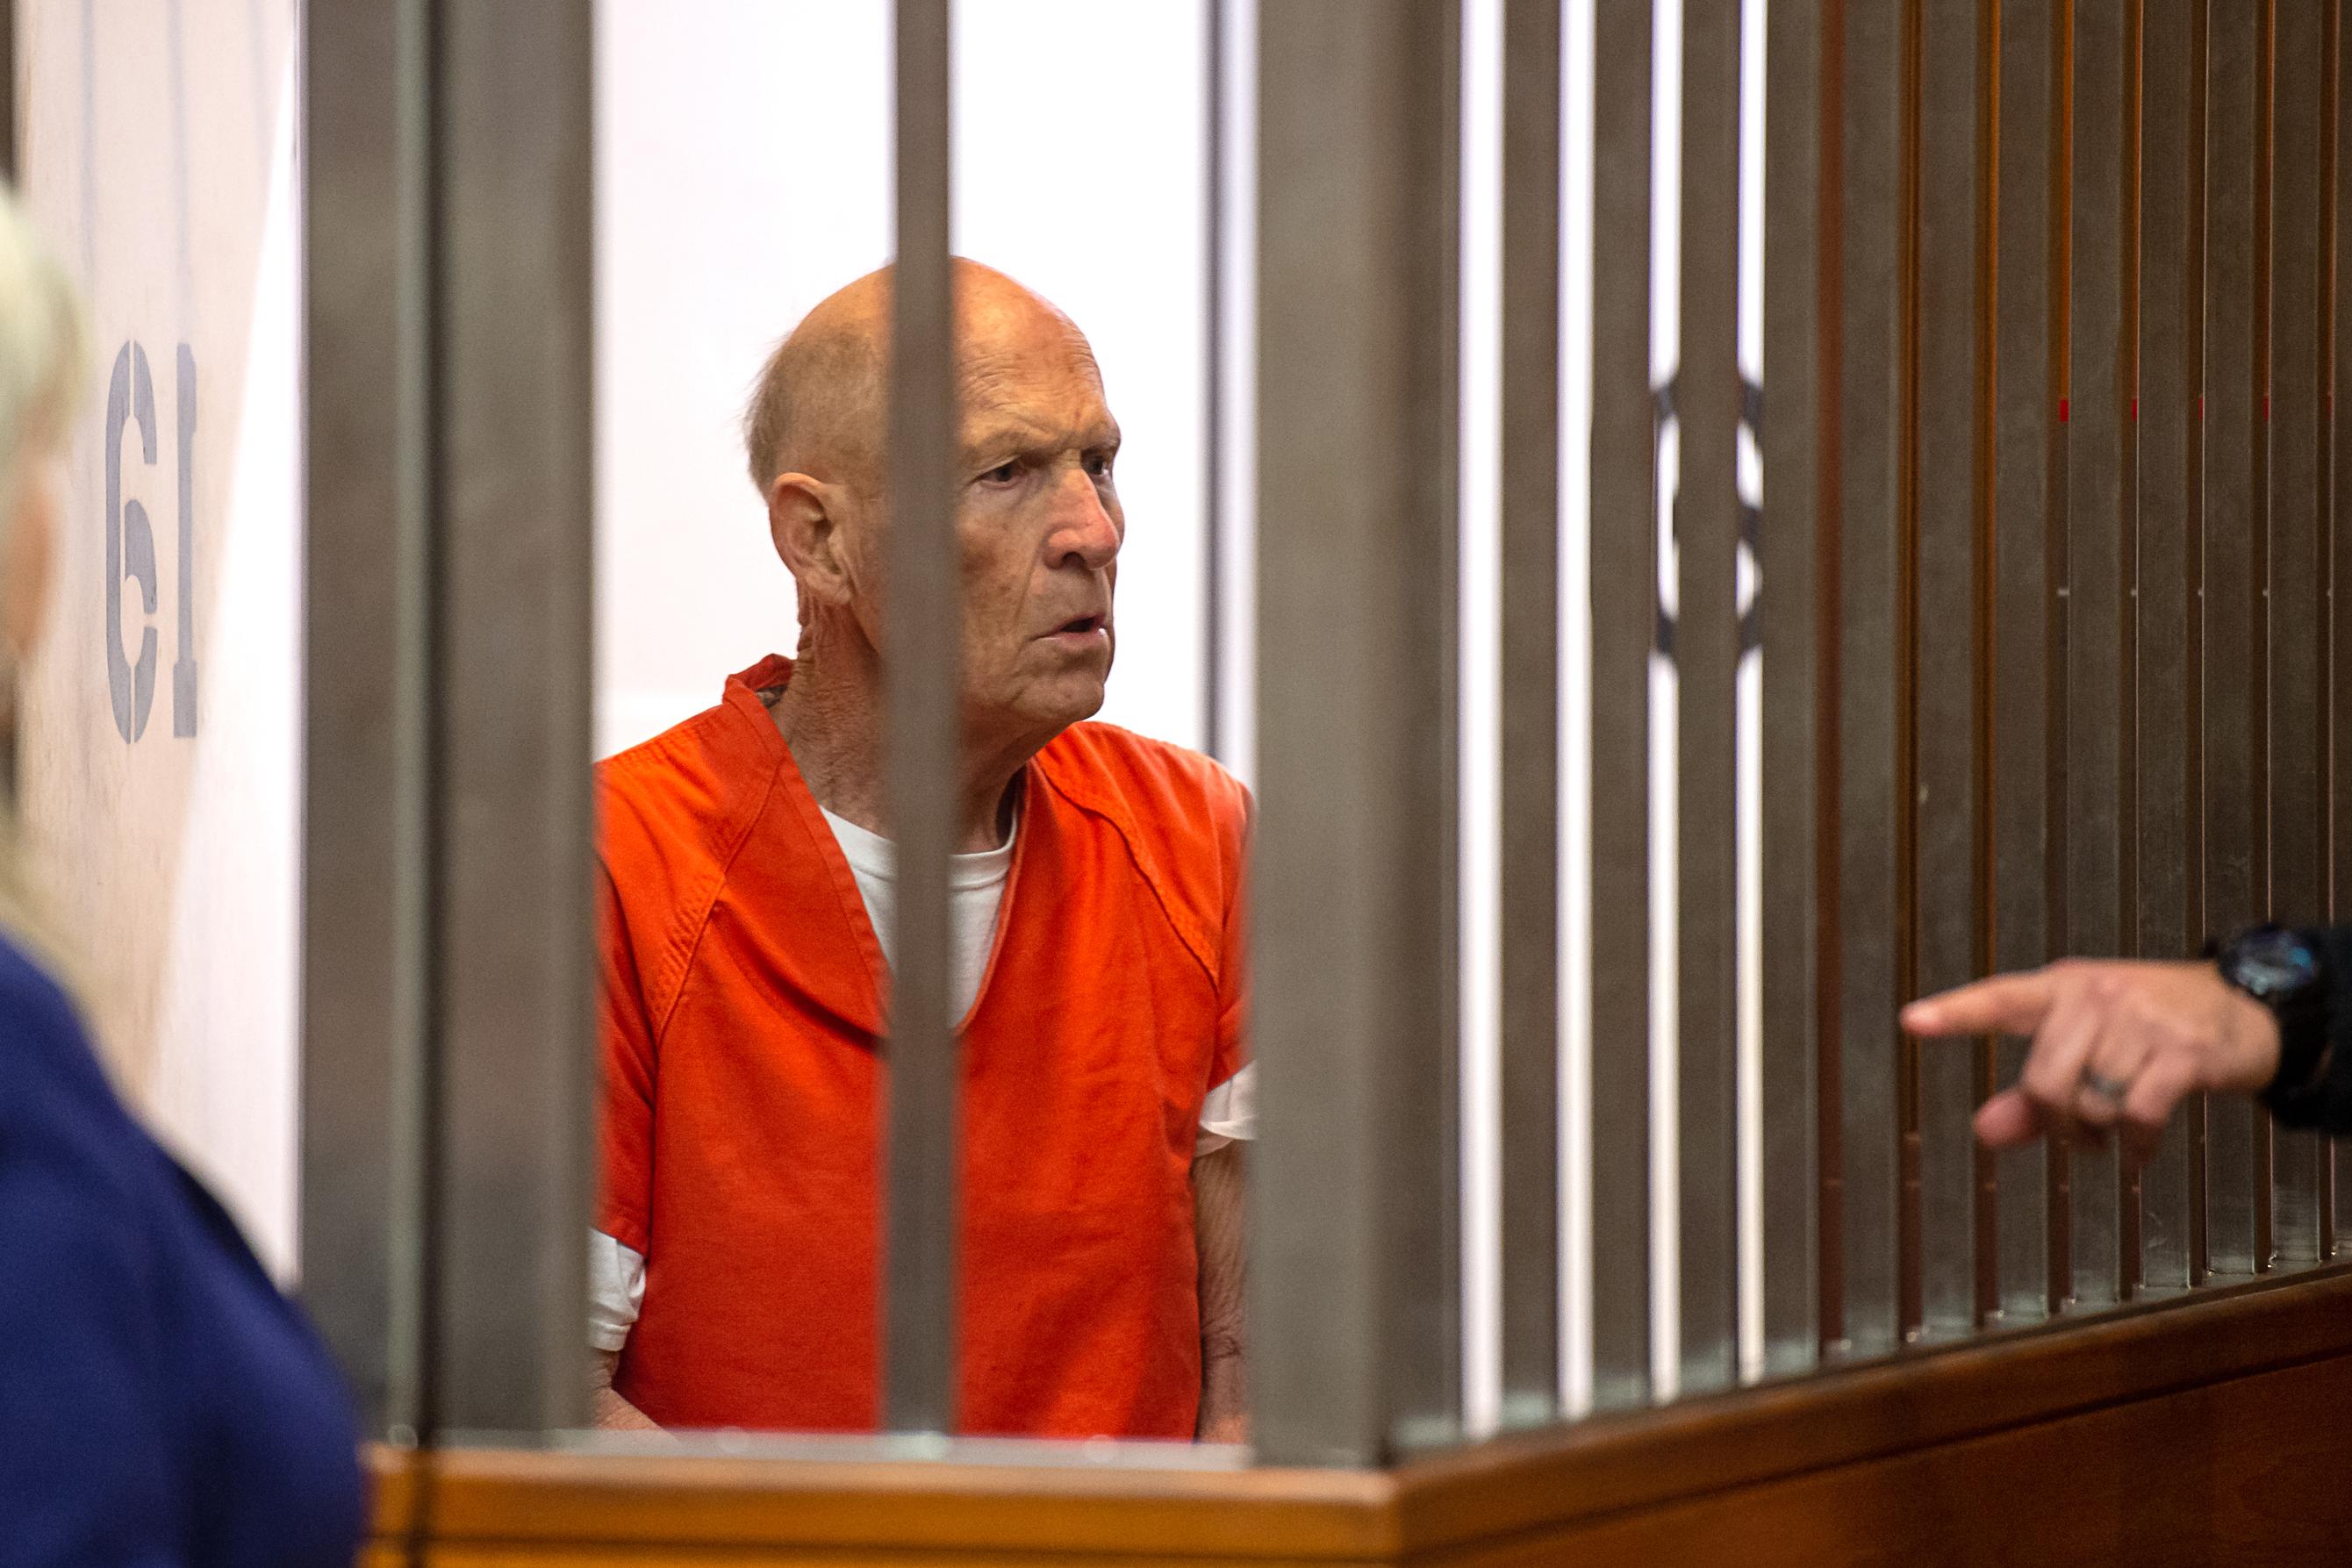 Alleged Golden State Killer, Joseph DeAngelo, Cleared of 1975 Murder